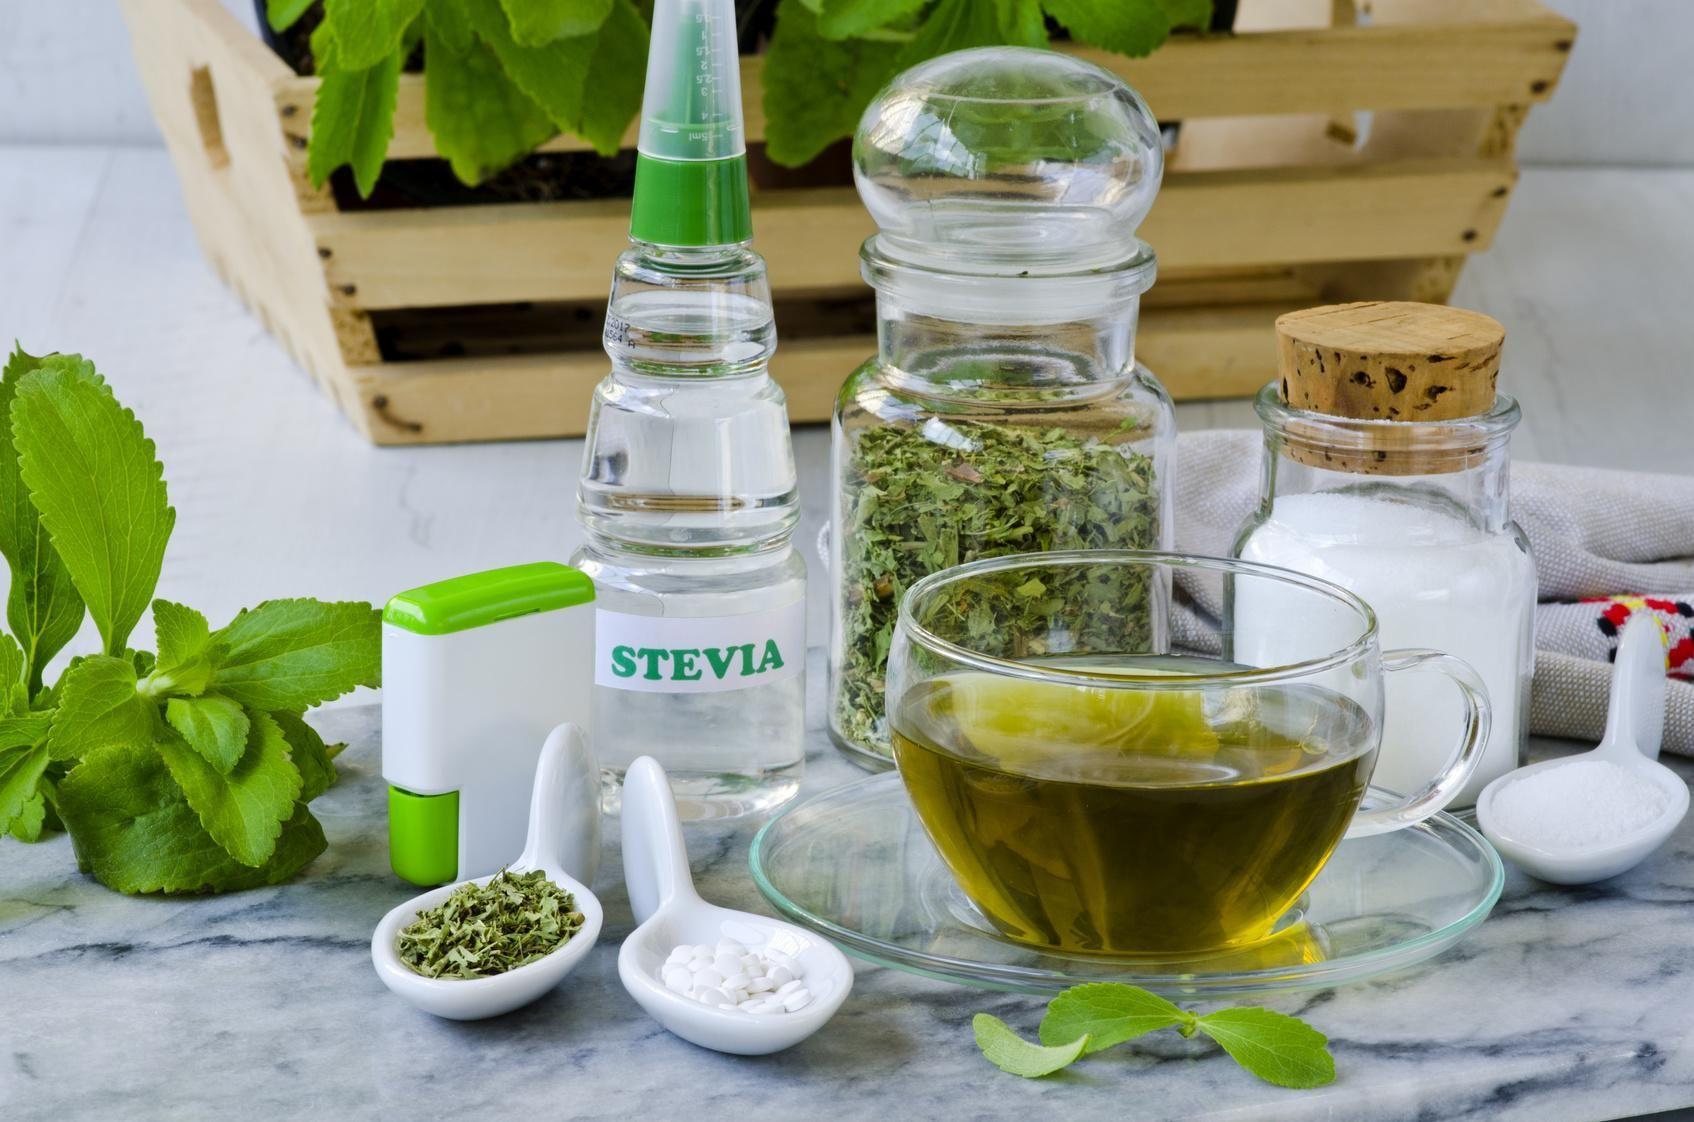 Stevia Diabetes Research